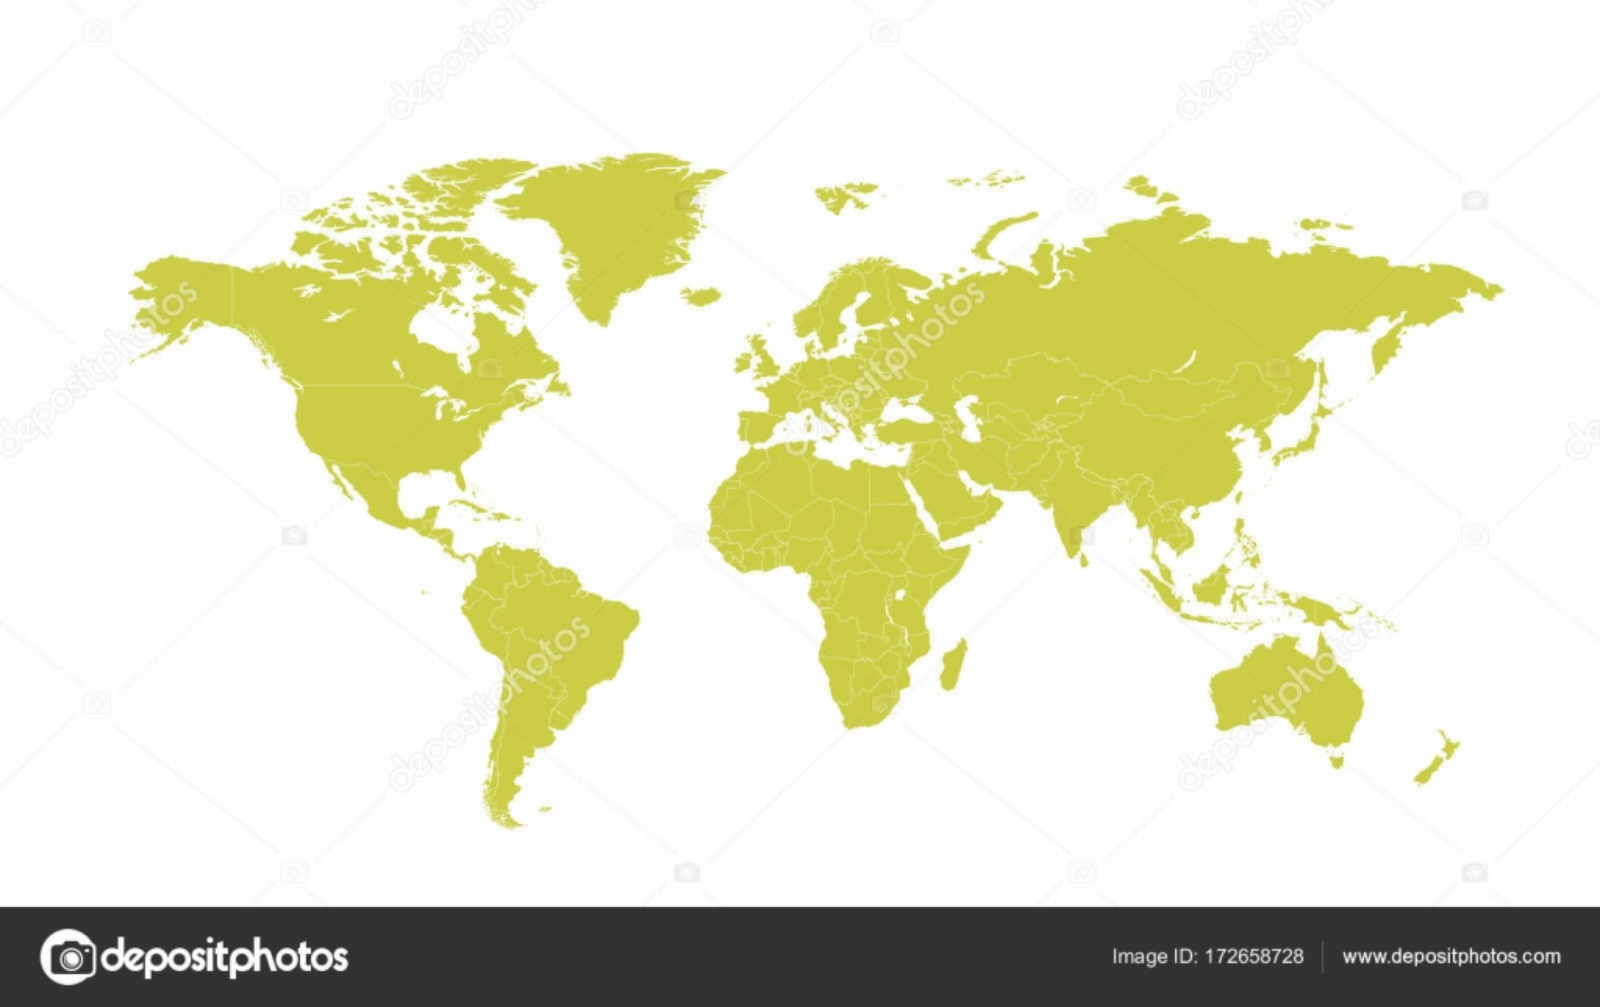 Political world map vector cartoon illustration stock vector political world map vector cartoon illustration stock vector gumiabroncs Choice Image